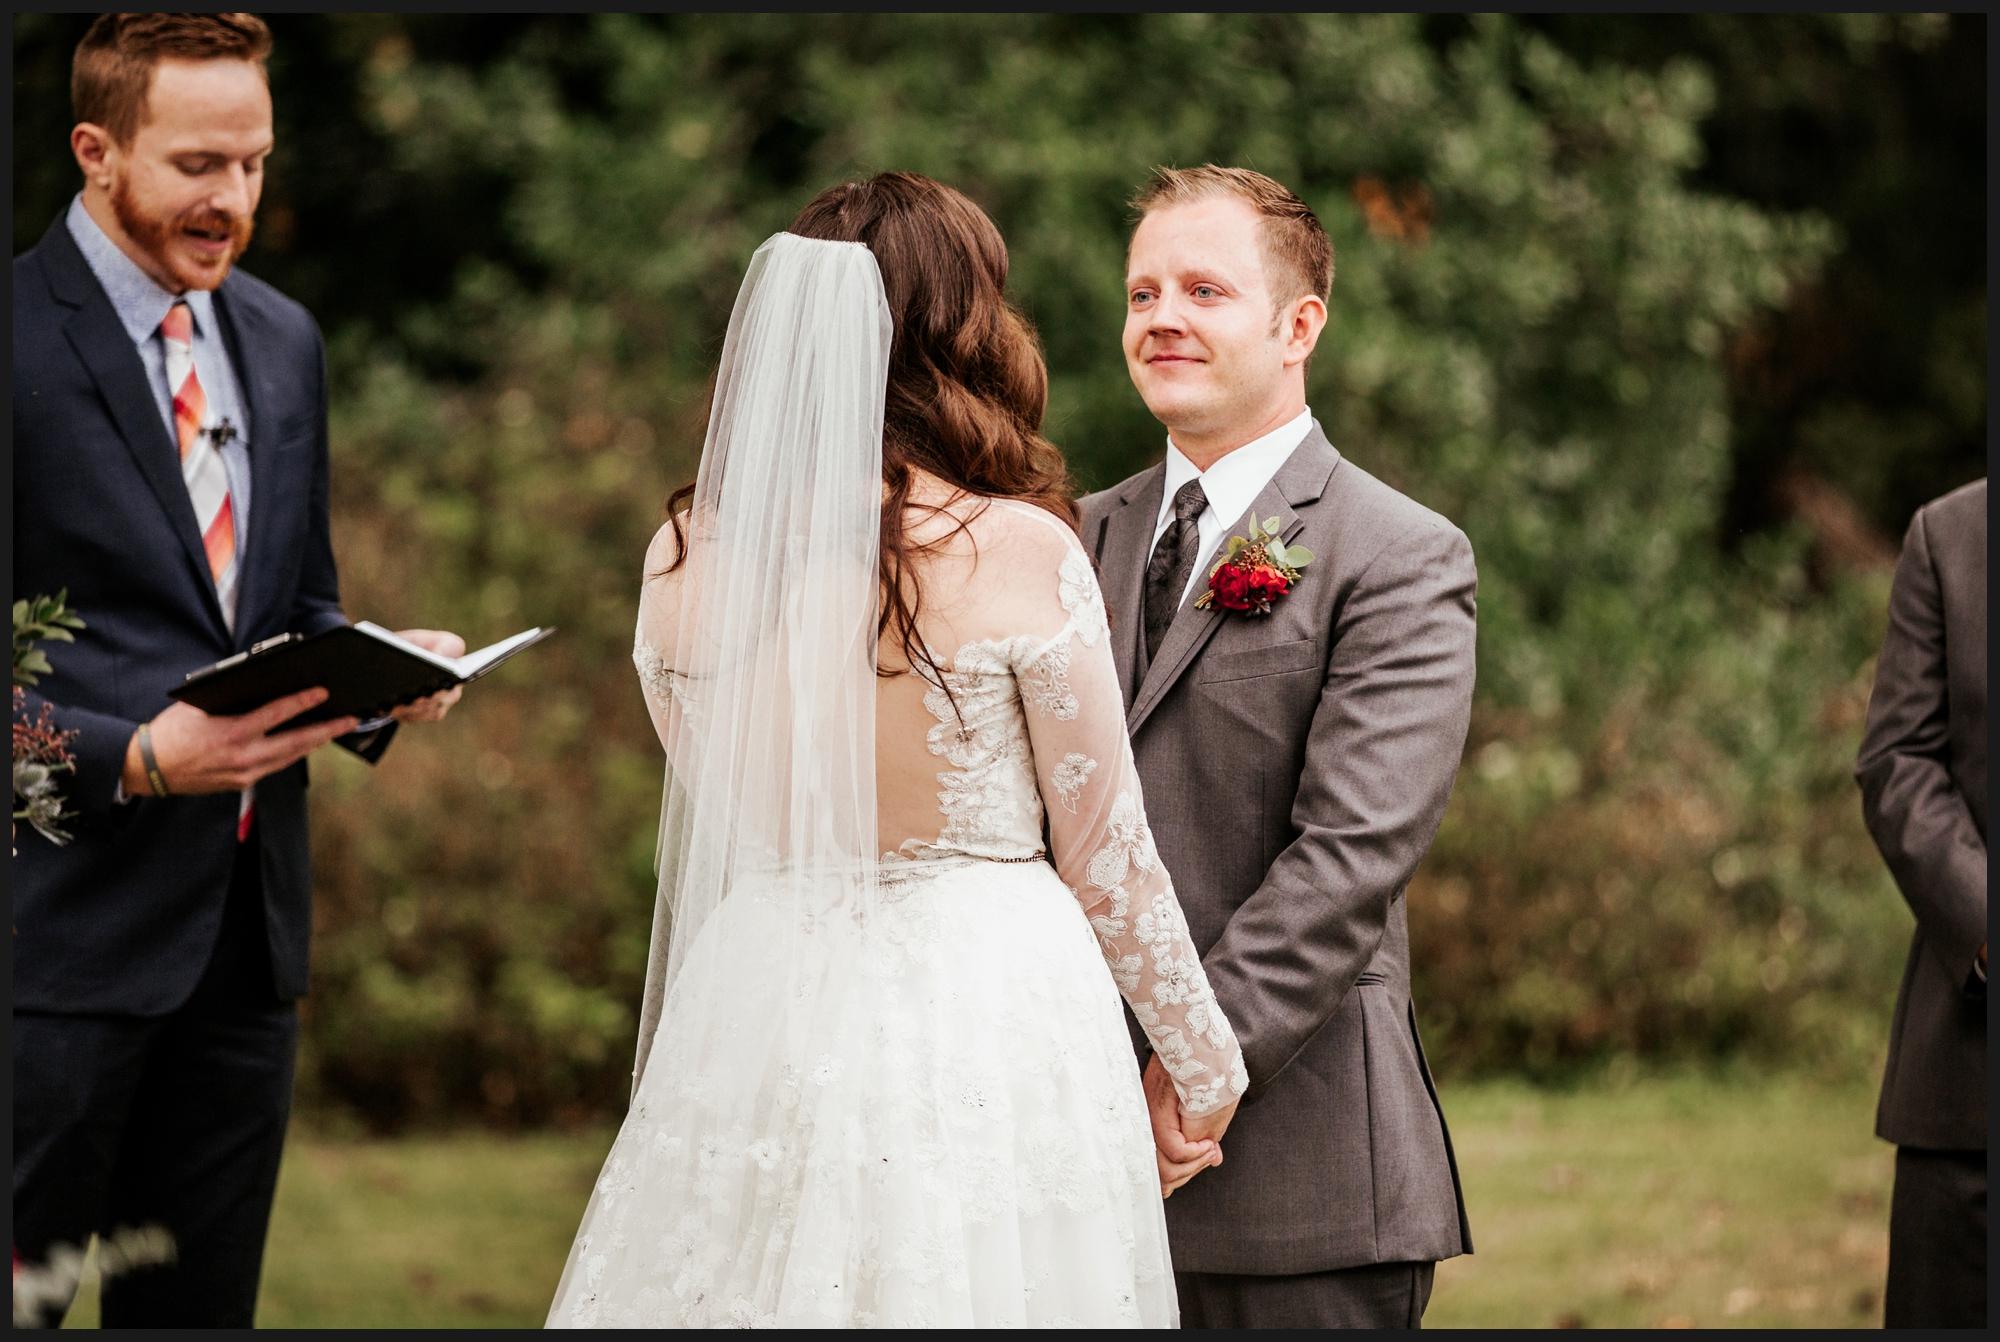 Orlando-Wedding-Photographer-destination-wedding-photographer-florida-wedding-photographer-hawaii-wedding-photographer_0523.jpg